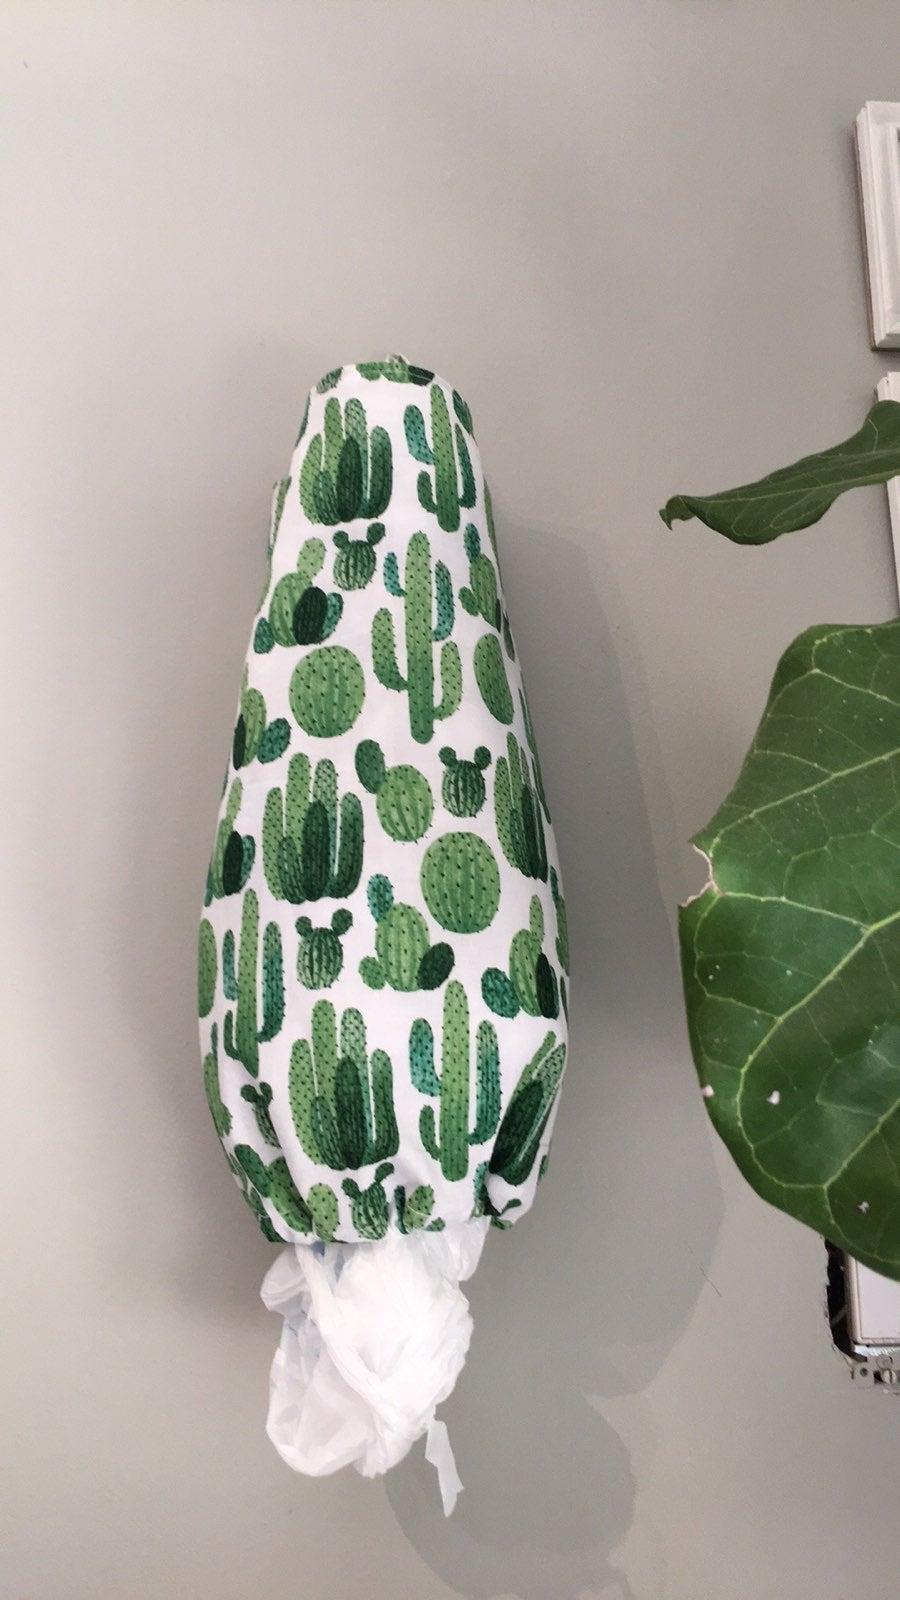 Cactus Grocery bag holder